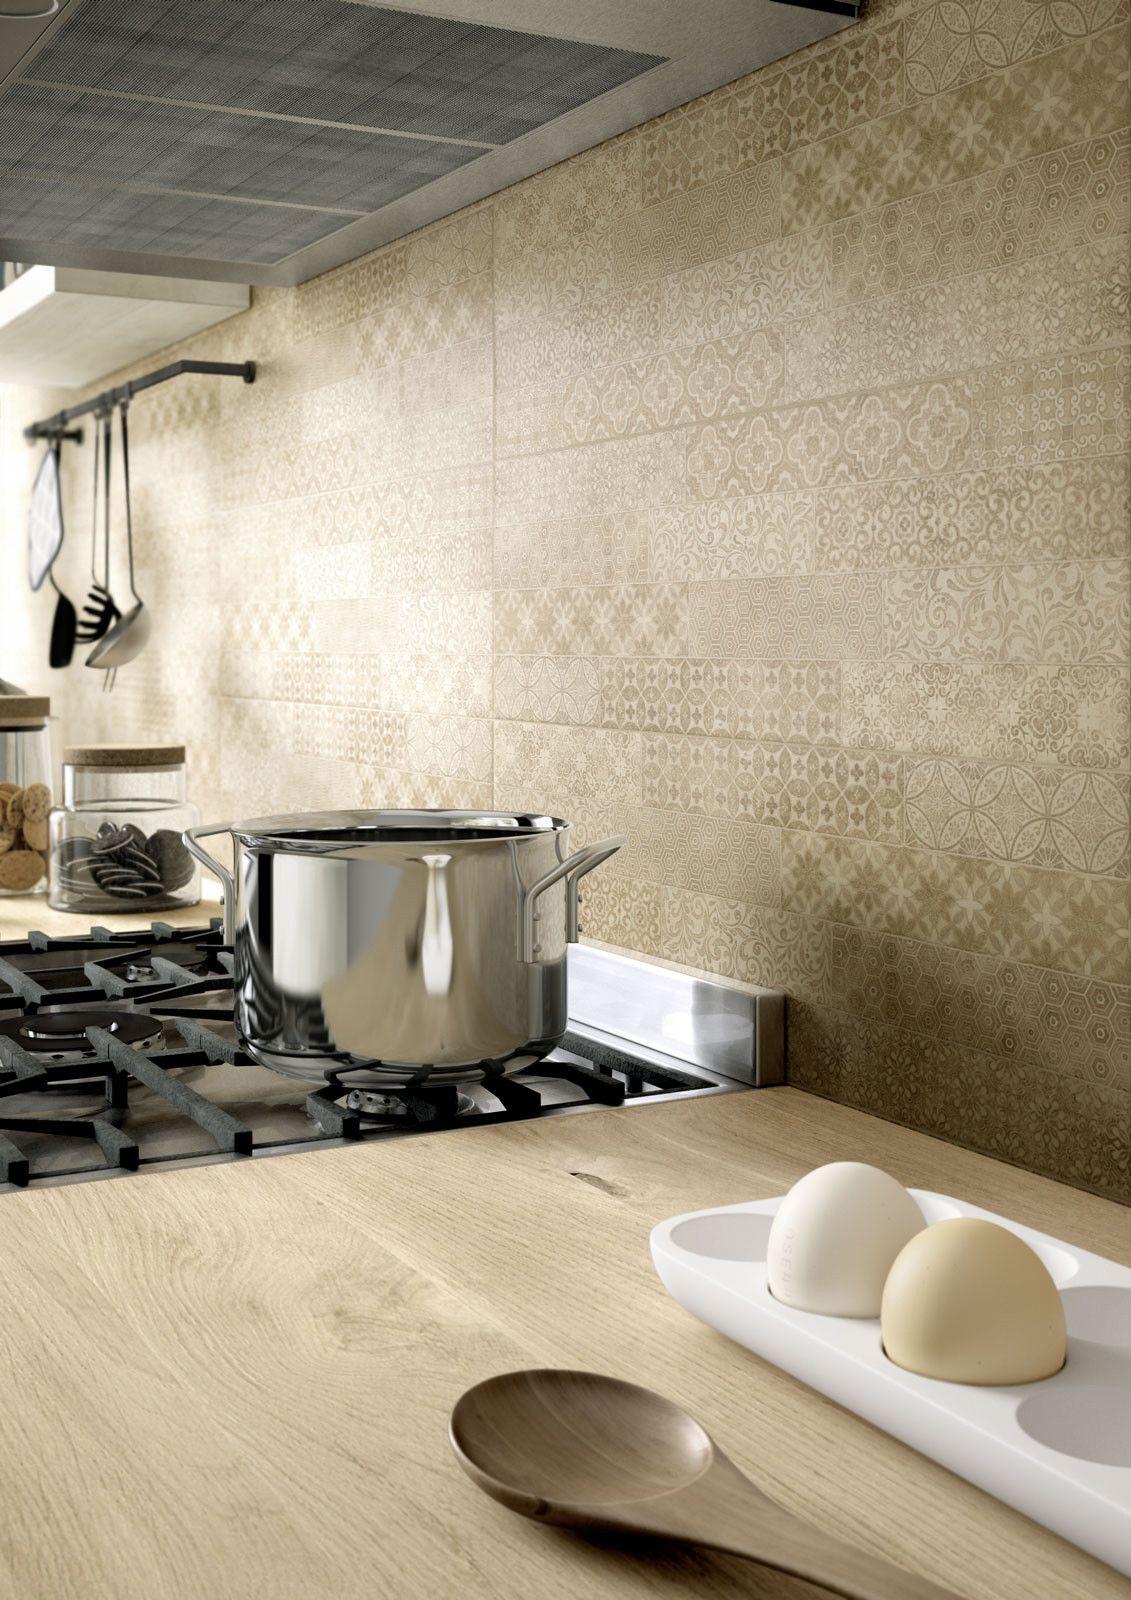 Marazzi #Clayline Decoro Pattern 22x66,2 cm MMUQ | #Gres #tinta ...